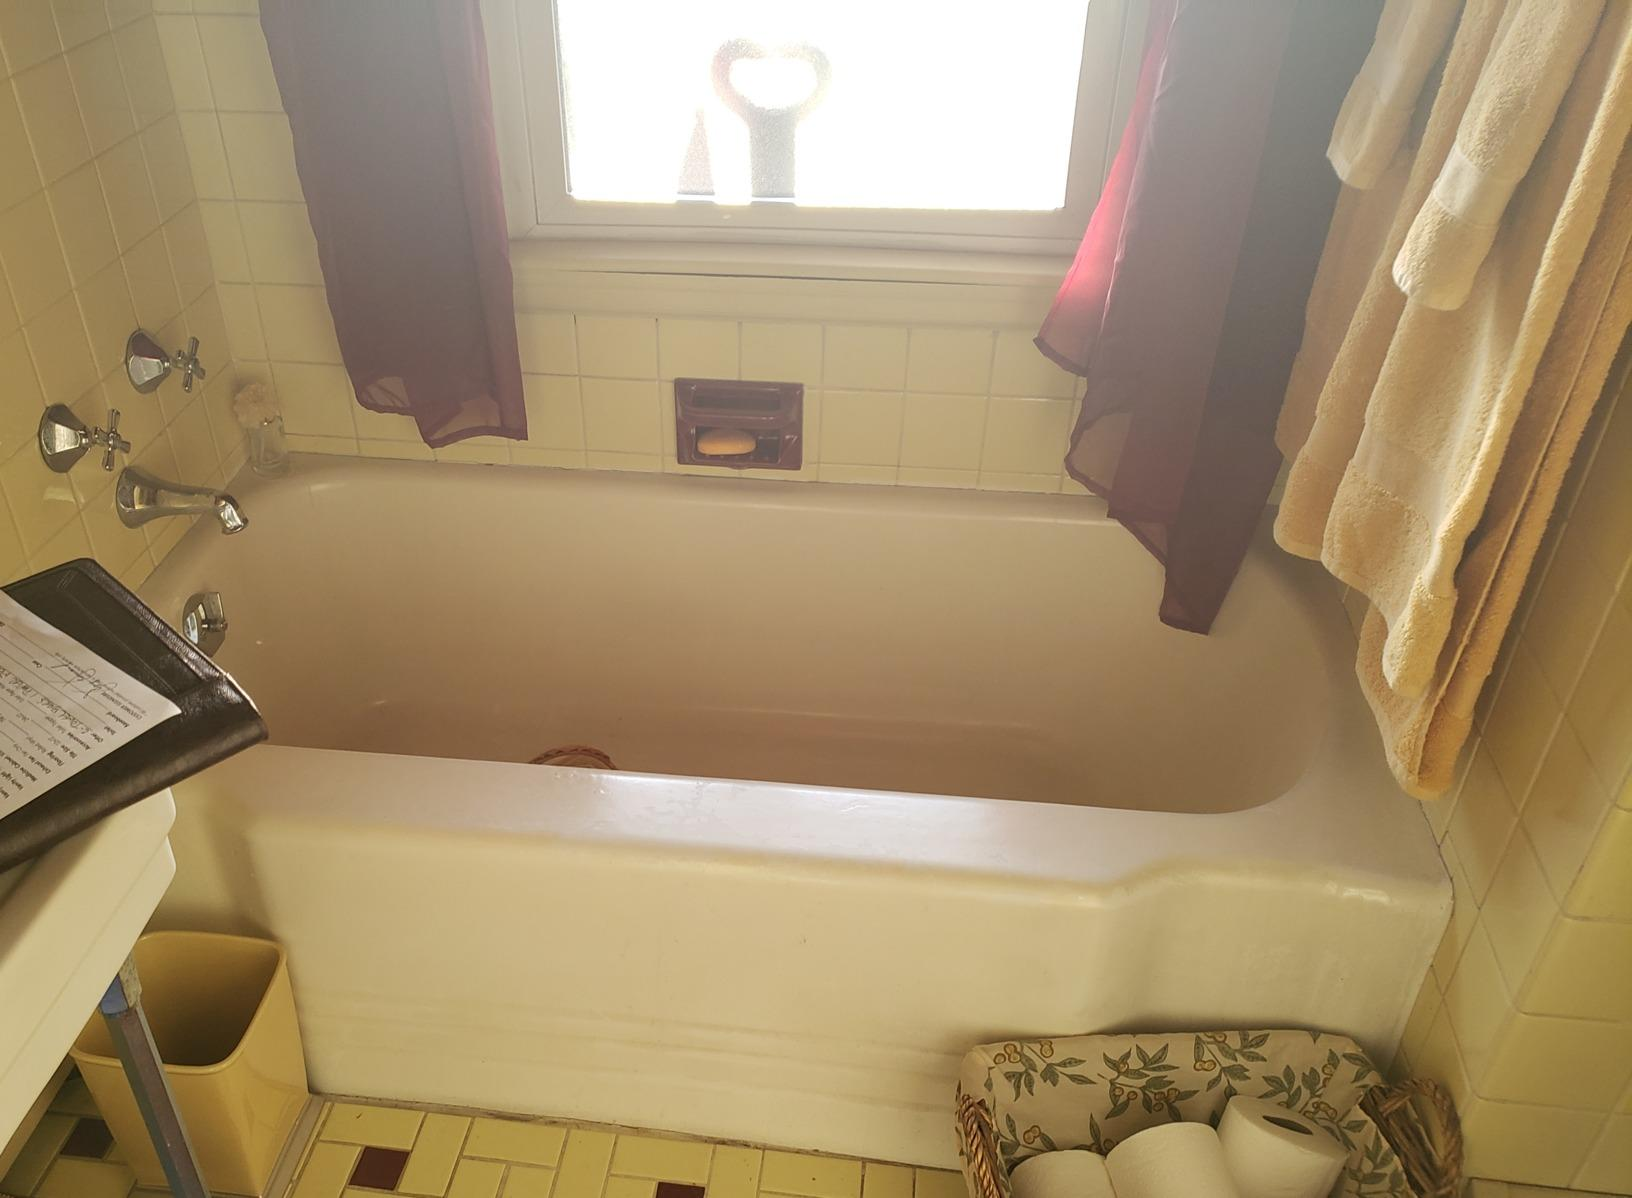 Bathroom Update in Defiance, Ohio - Before Photo